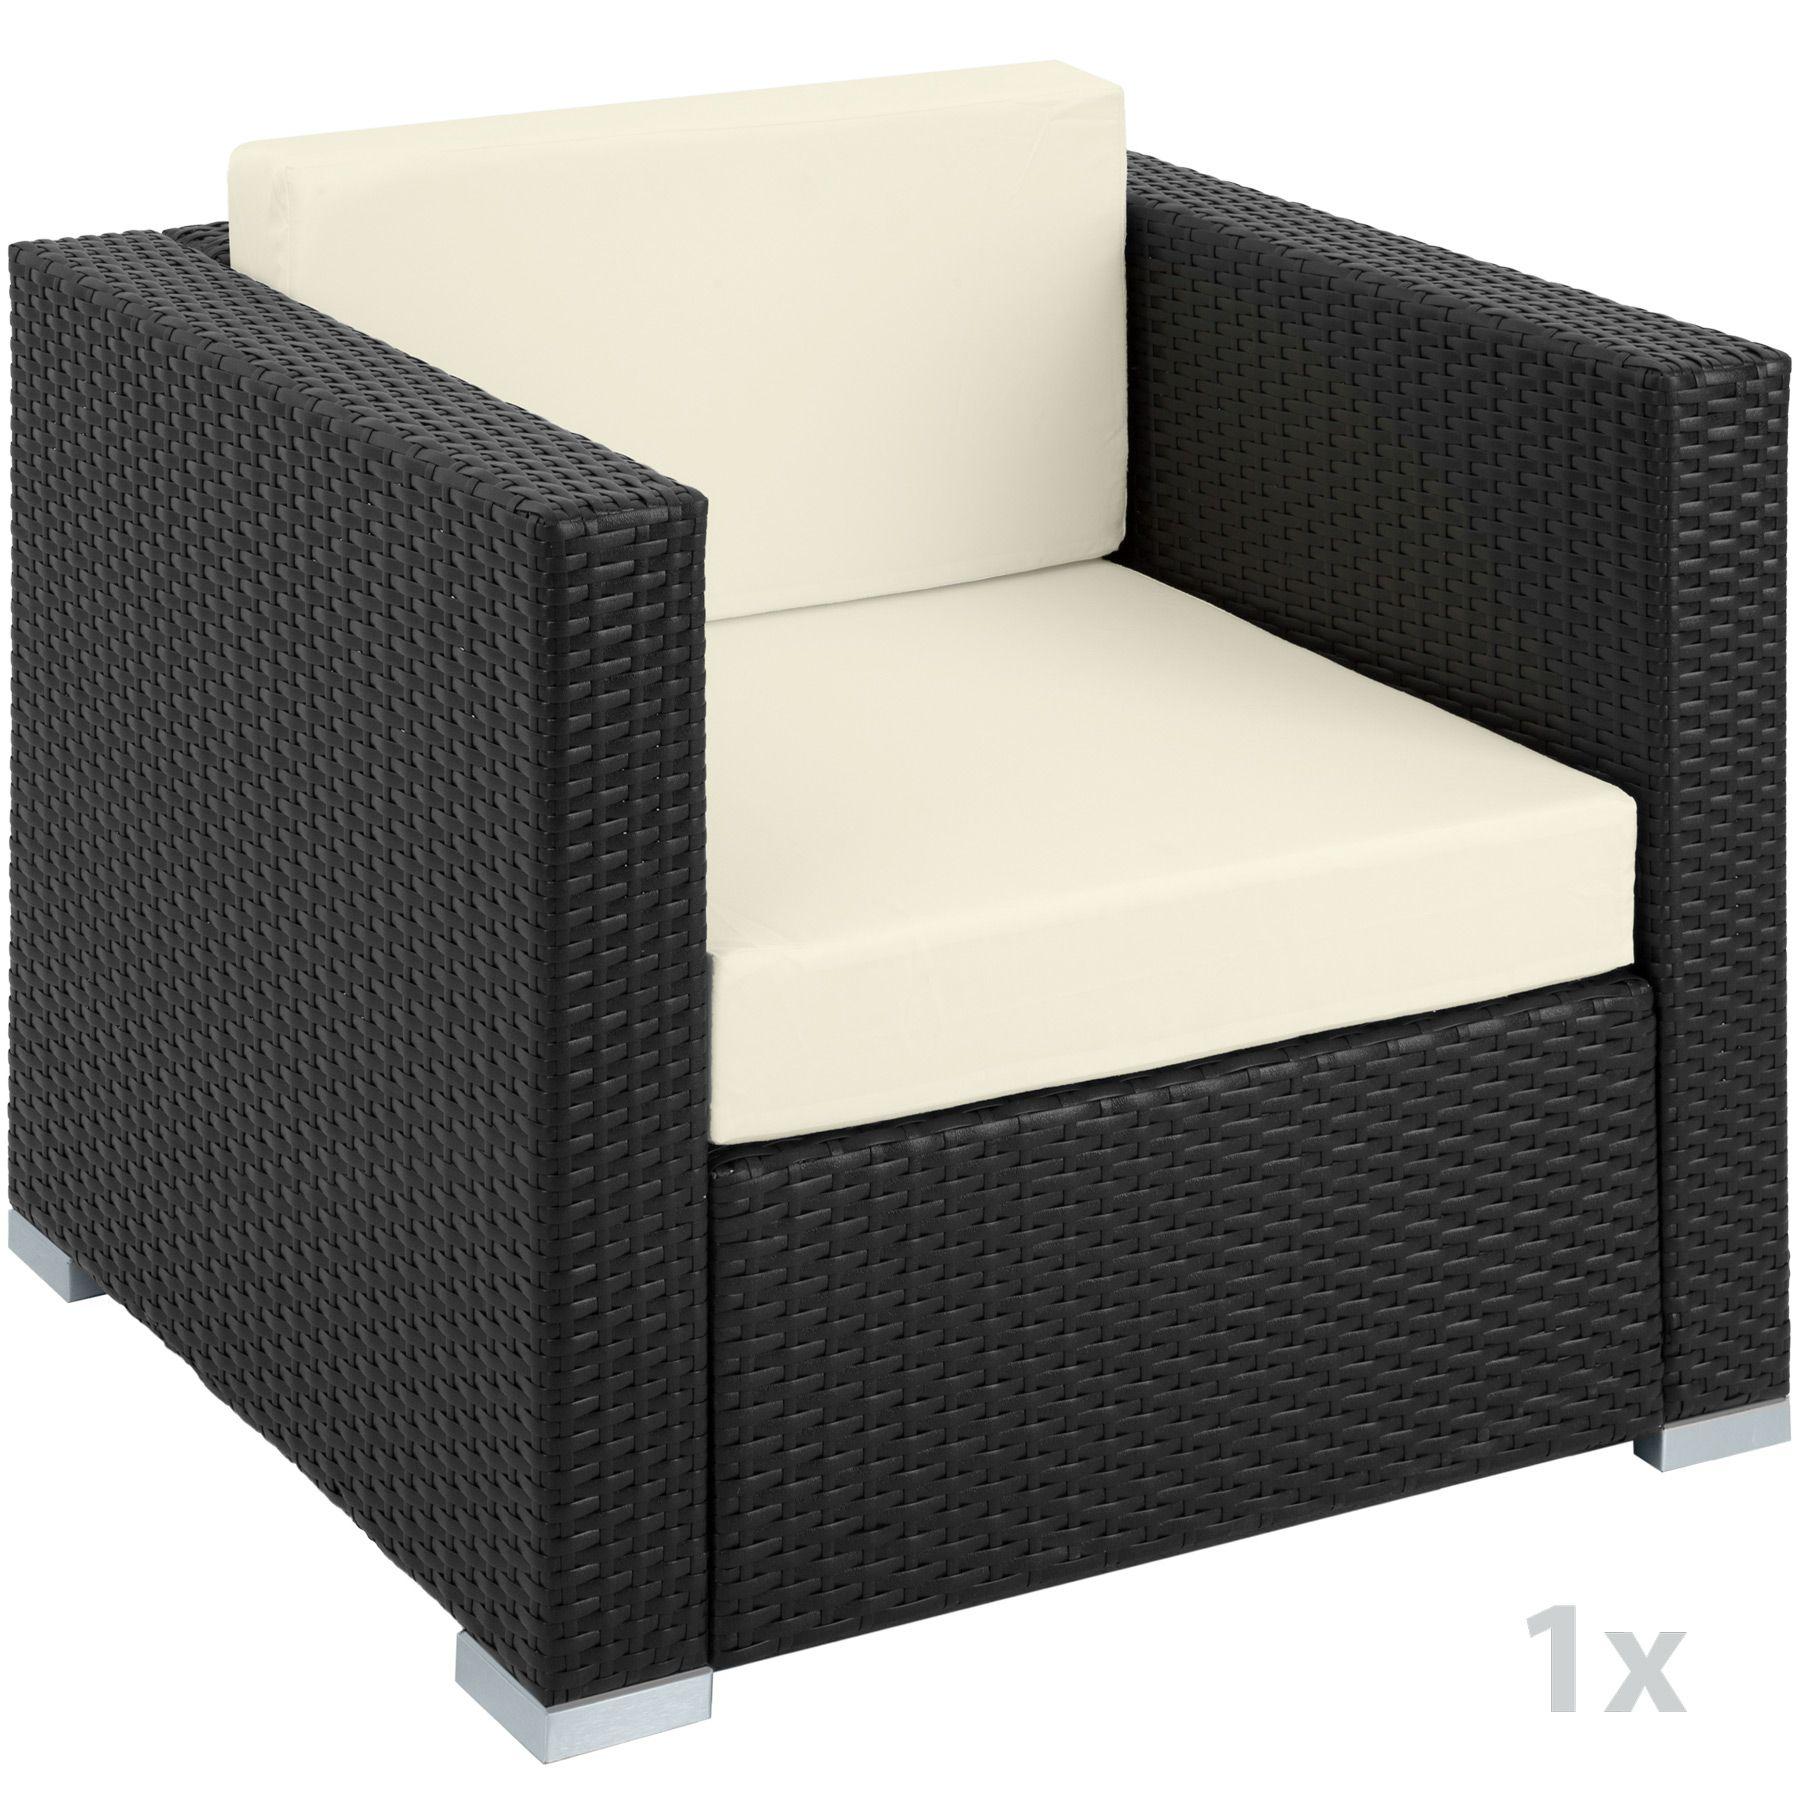 XXL Poly Rattan Alu Sitzgruppe Lounge Rattanmöbel Gartenmöbel Sofa ...